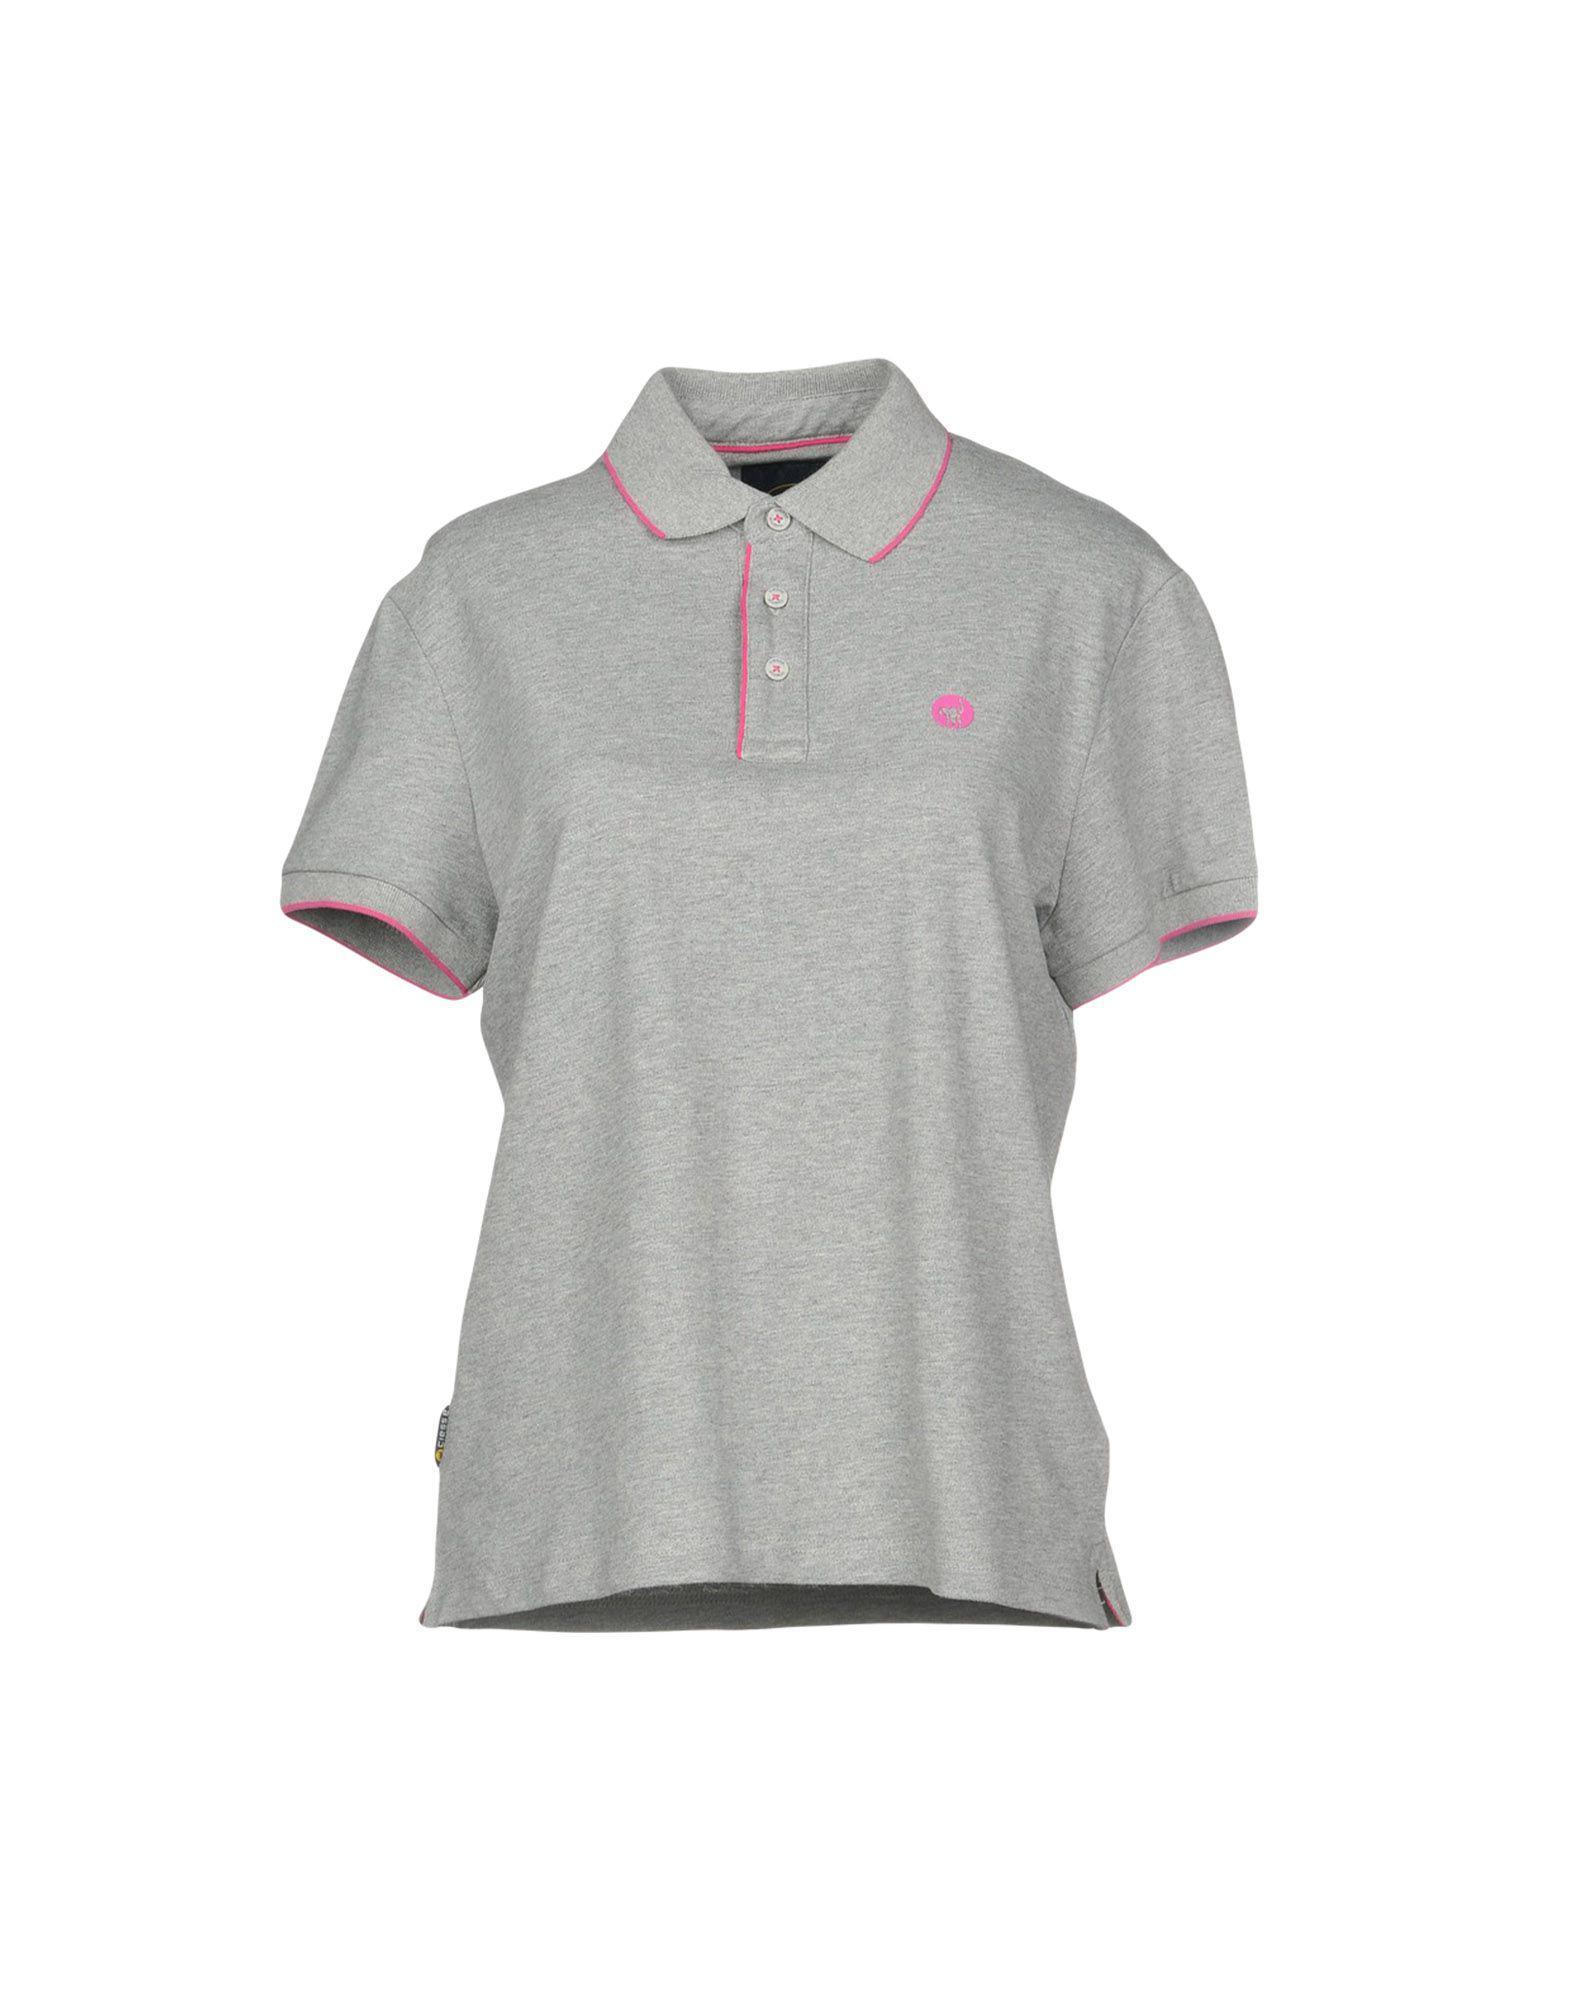 online store b4ffb 9d51f Ciesse Piumini Polo Shirt in Gray - Lyst